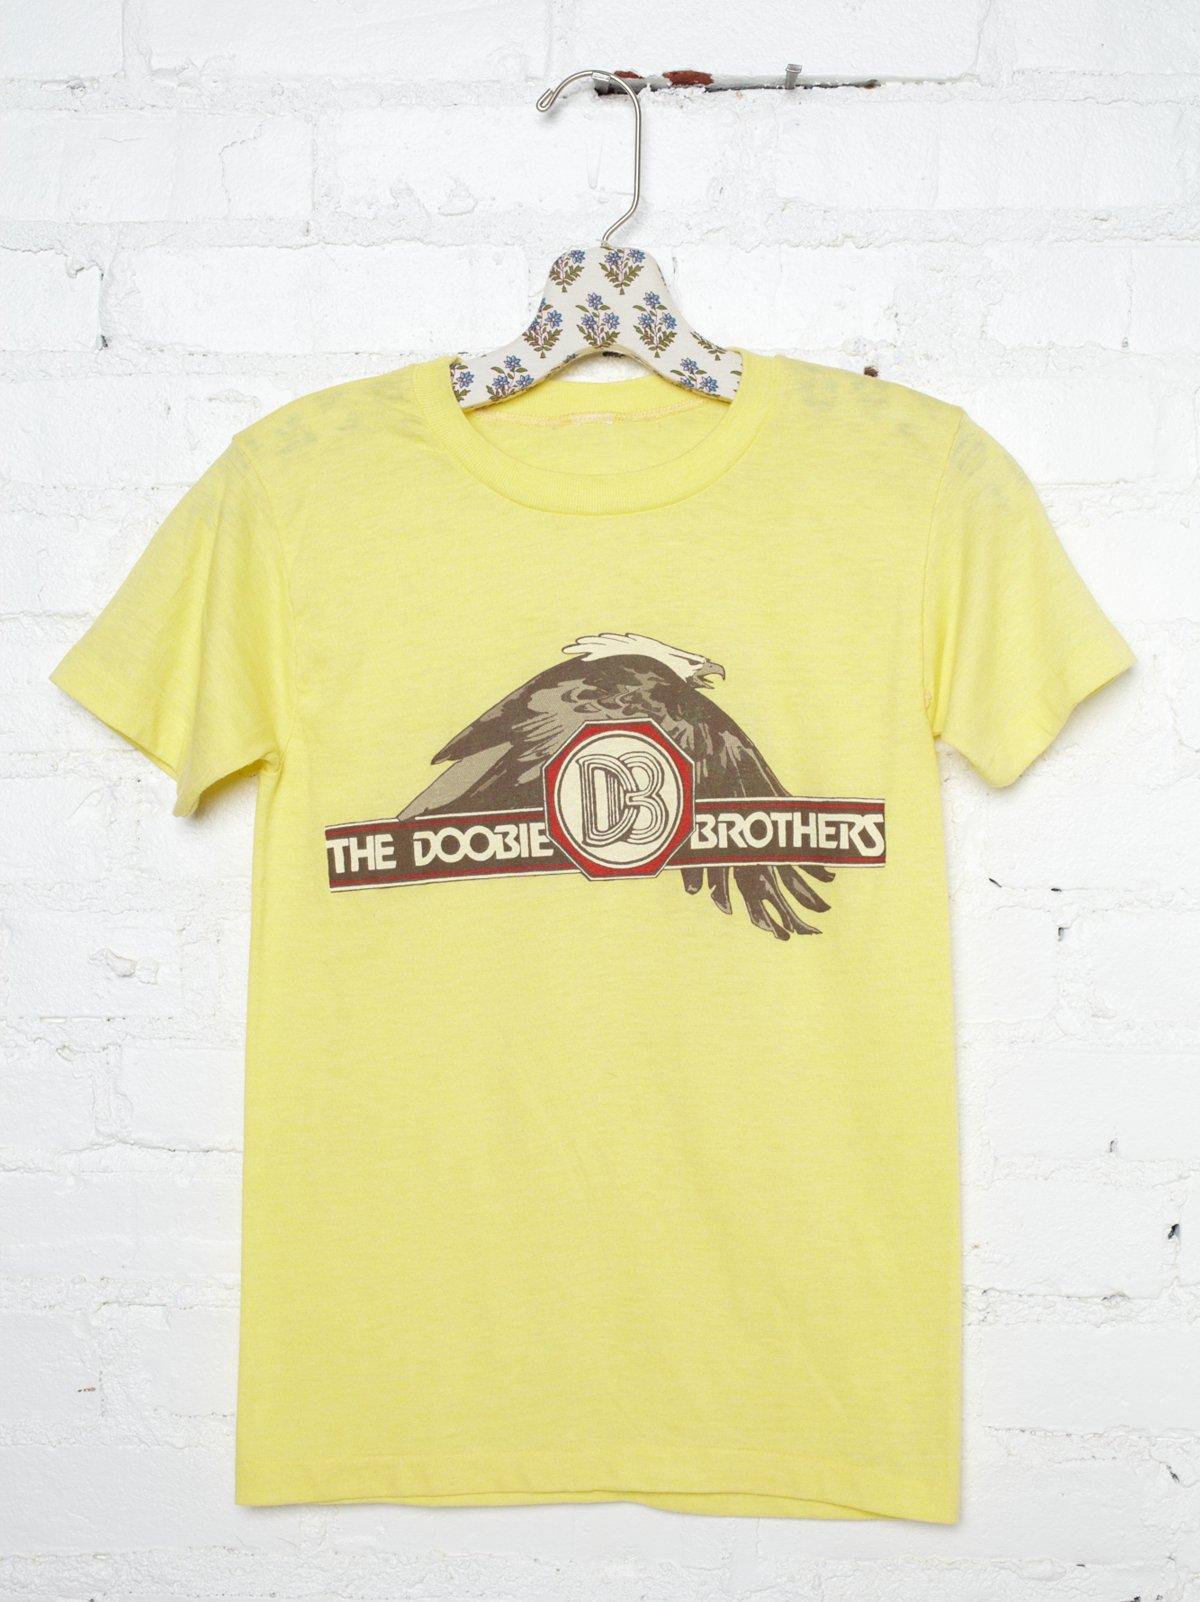 Vintage Doobie Brothers Tee